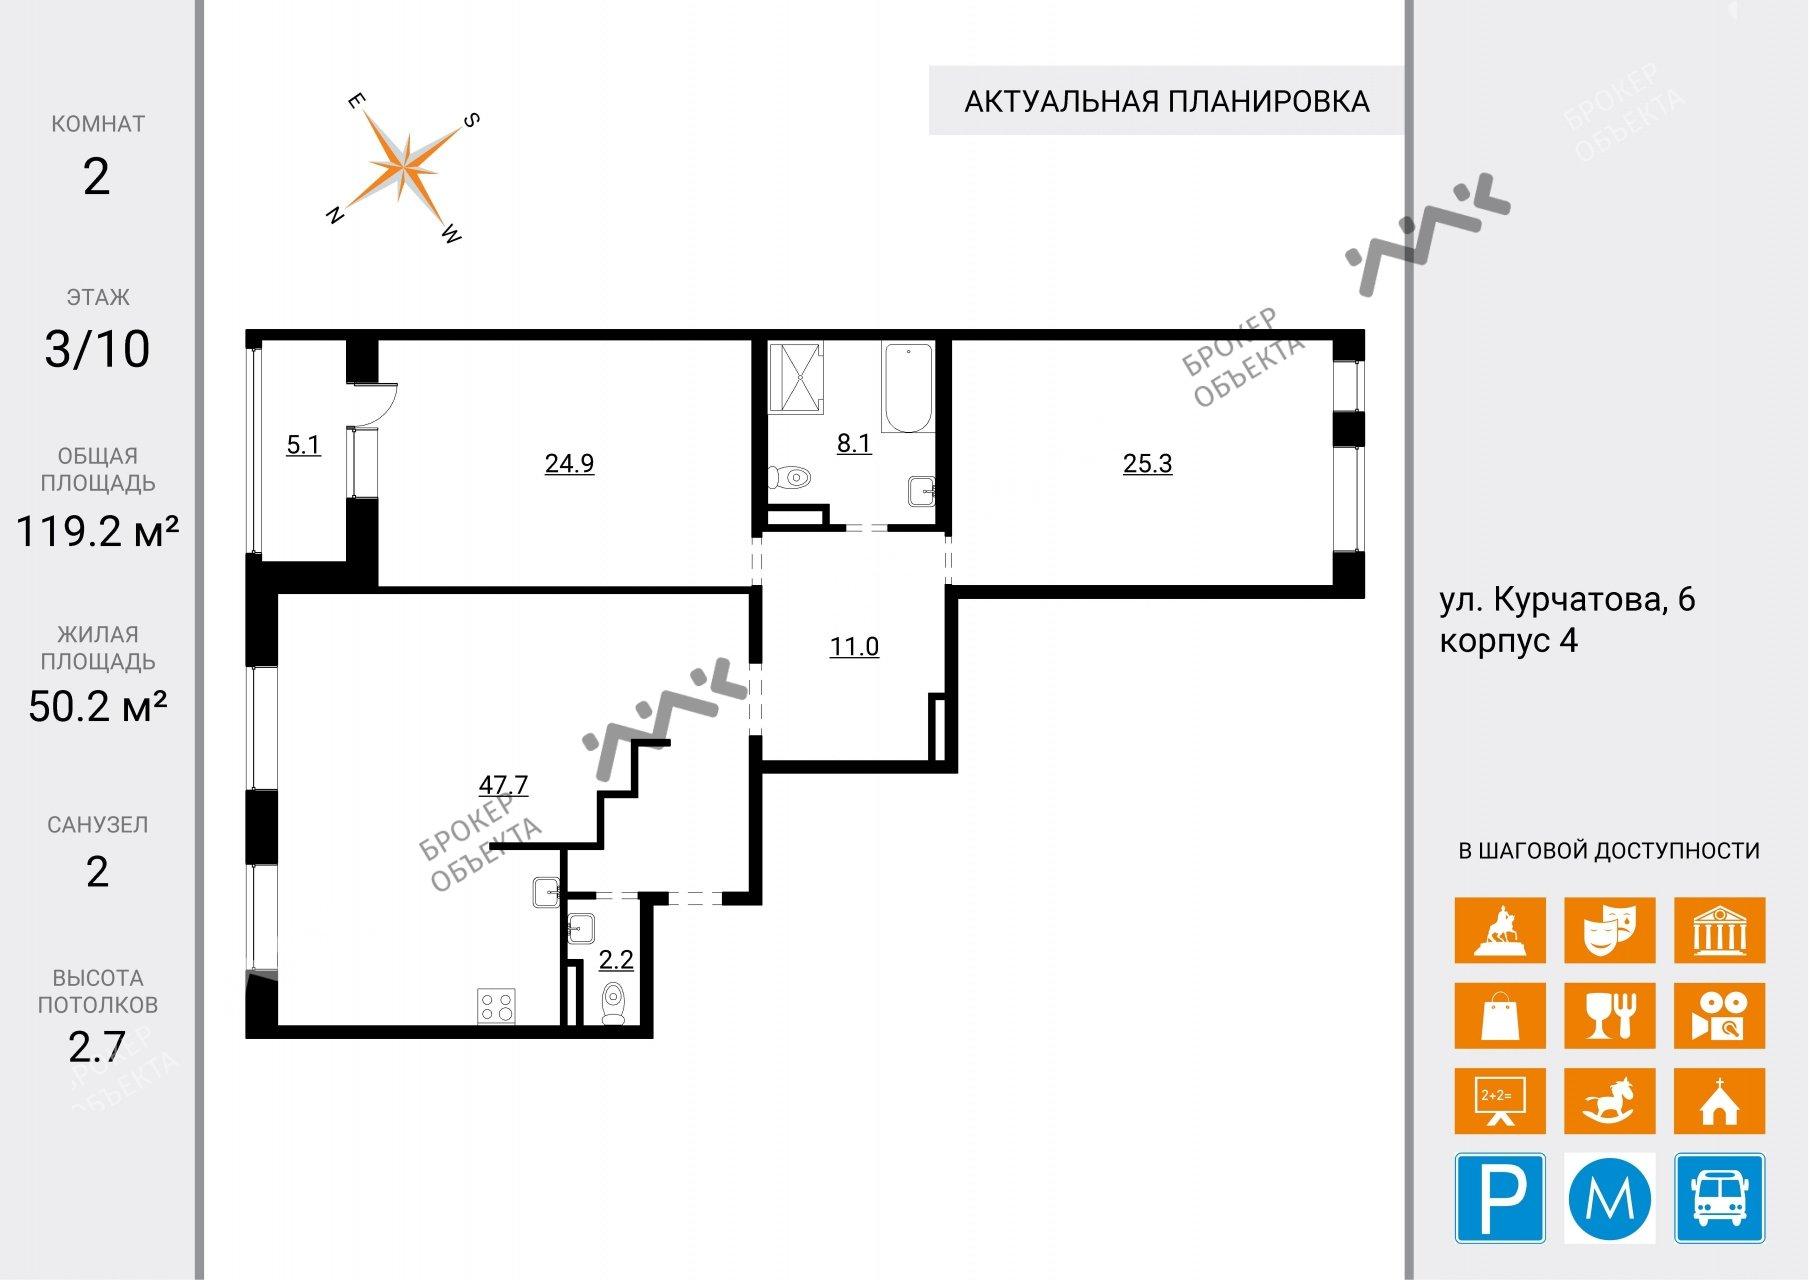 Планировка Курчатова ул., д.6, к.4, лит.А. Лот № 9205690